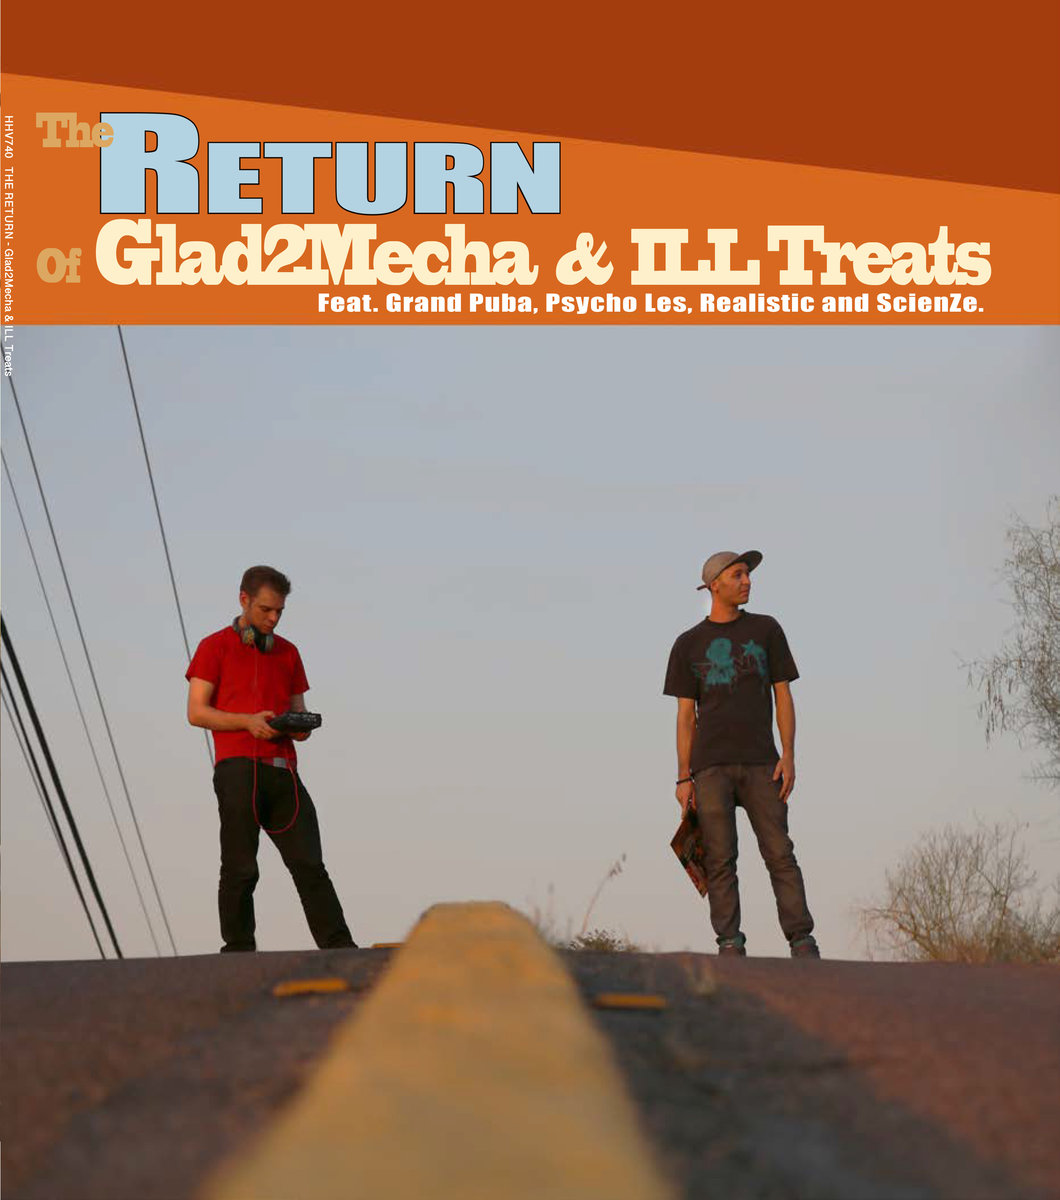 Glad2mecha___illtreats_the_return_lp